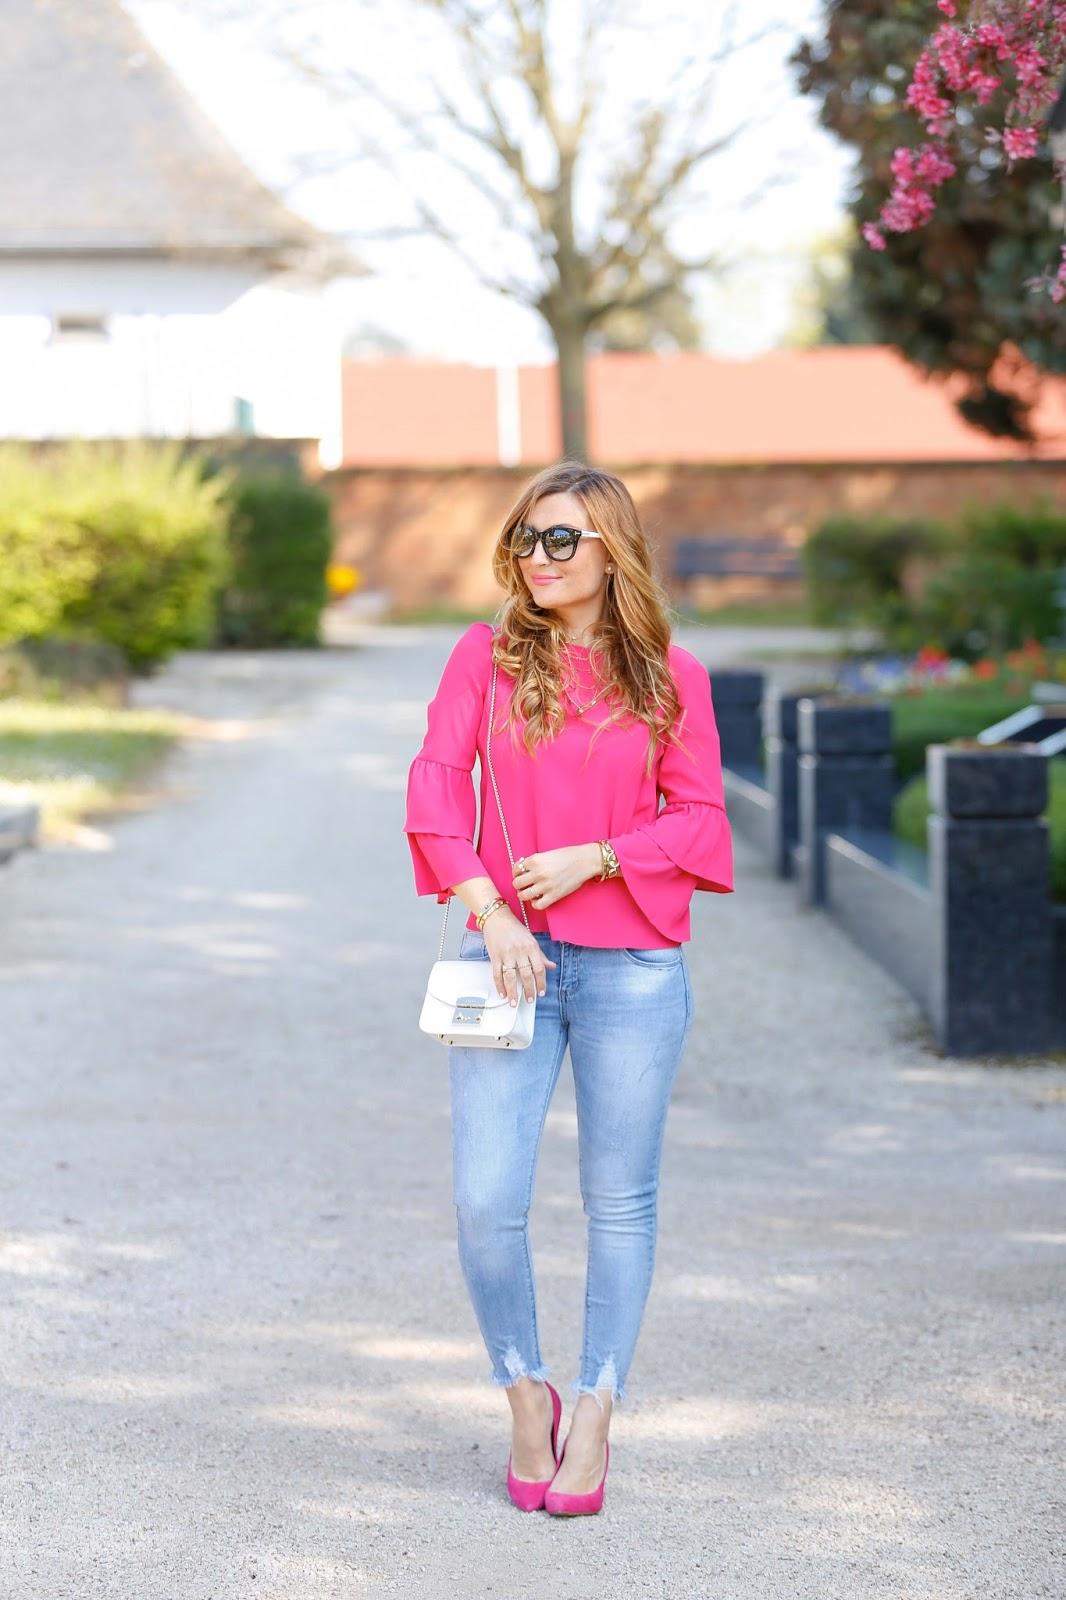 Pinke-High-heels-fashionblogger-aus-deutschland-deutsche-fashionblogger-fashionstylebyjohanna